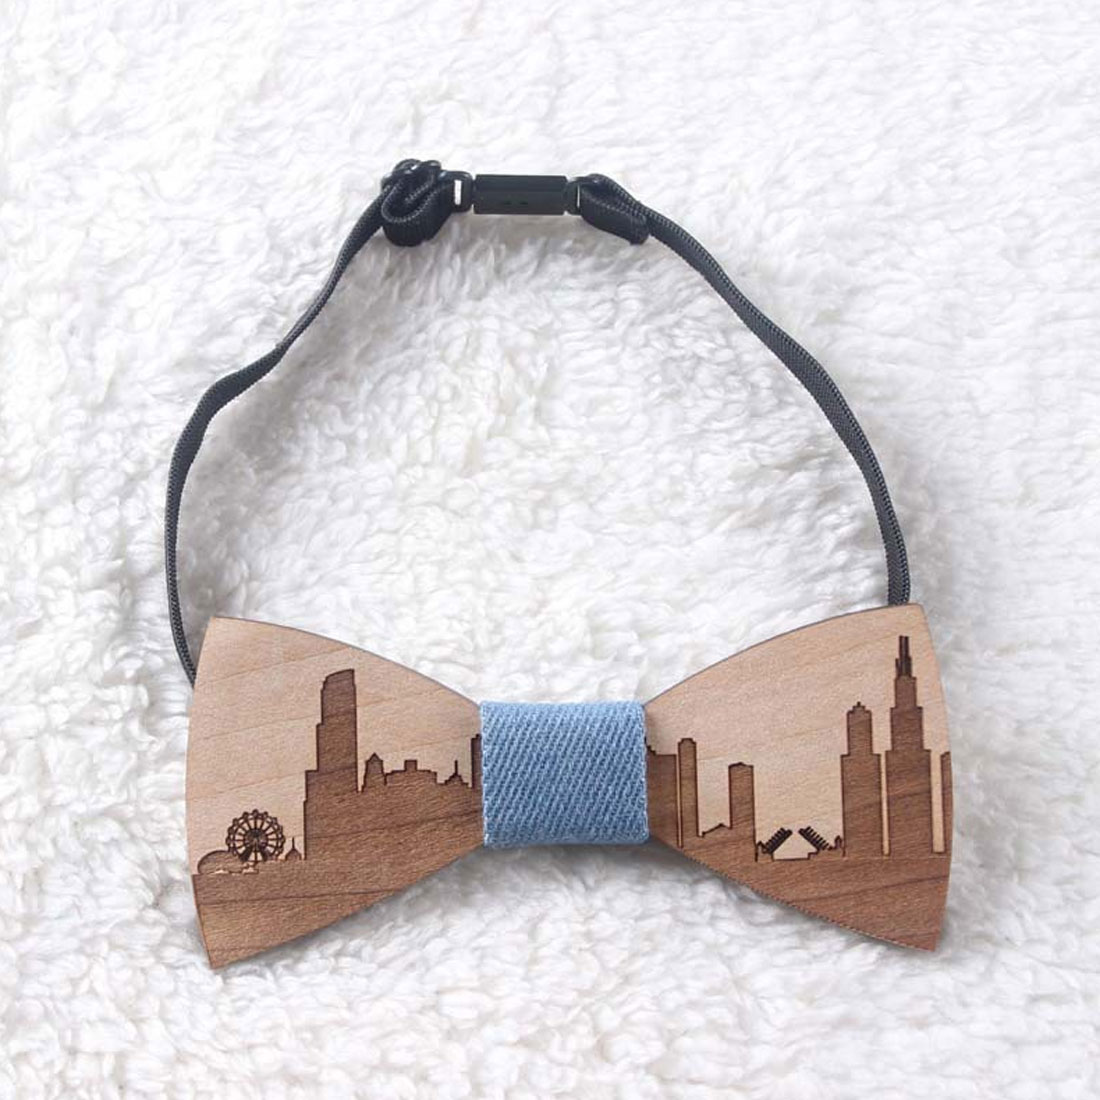 Wedding Bow Tie Wooden Butterfly City Skyline For Men/'s Suit Shirt Necktie